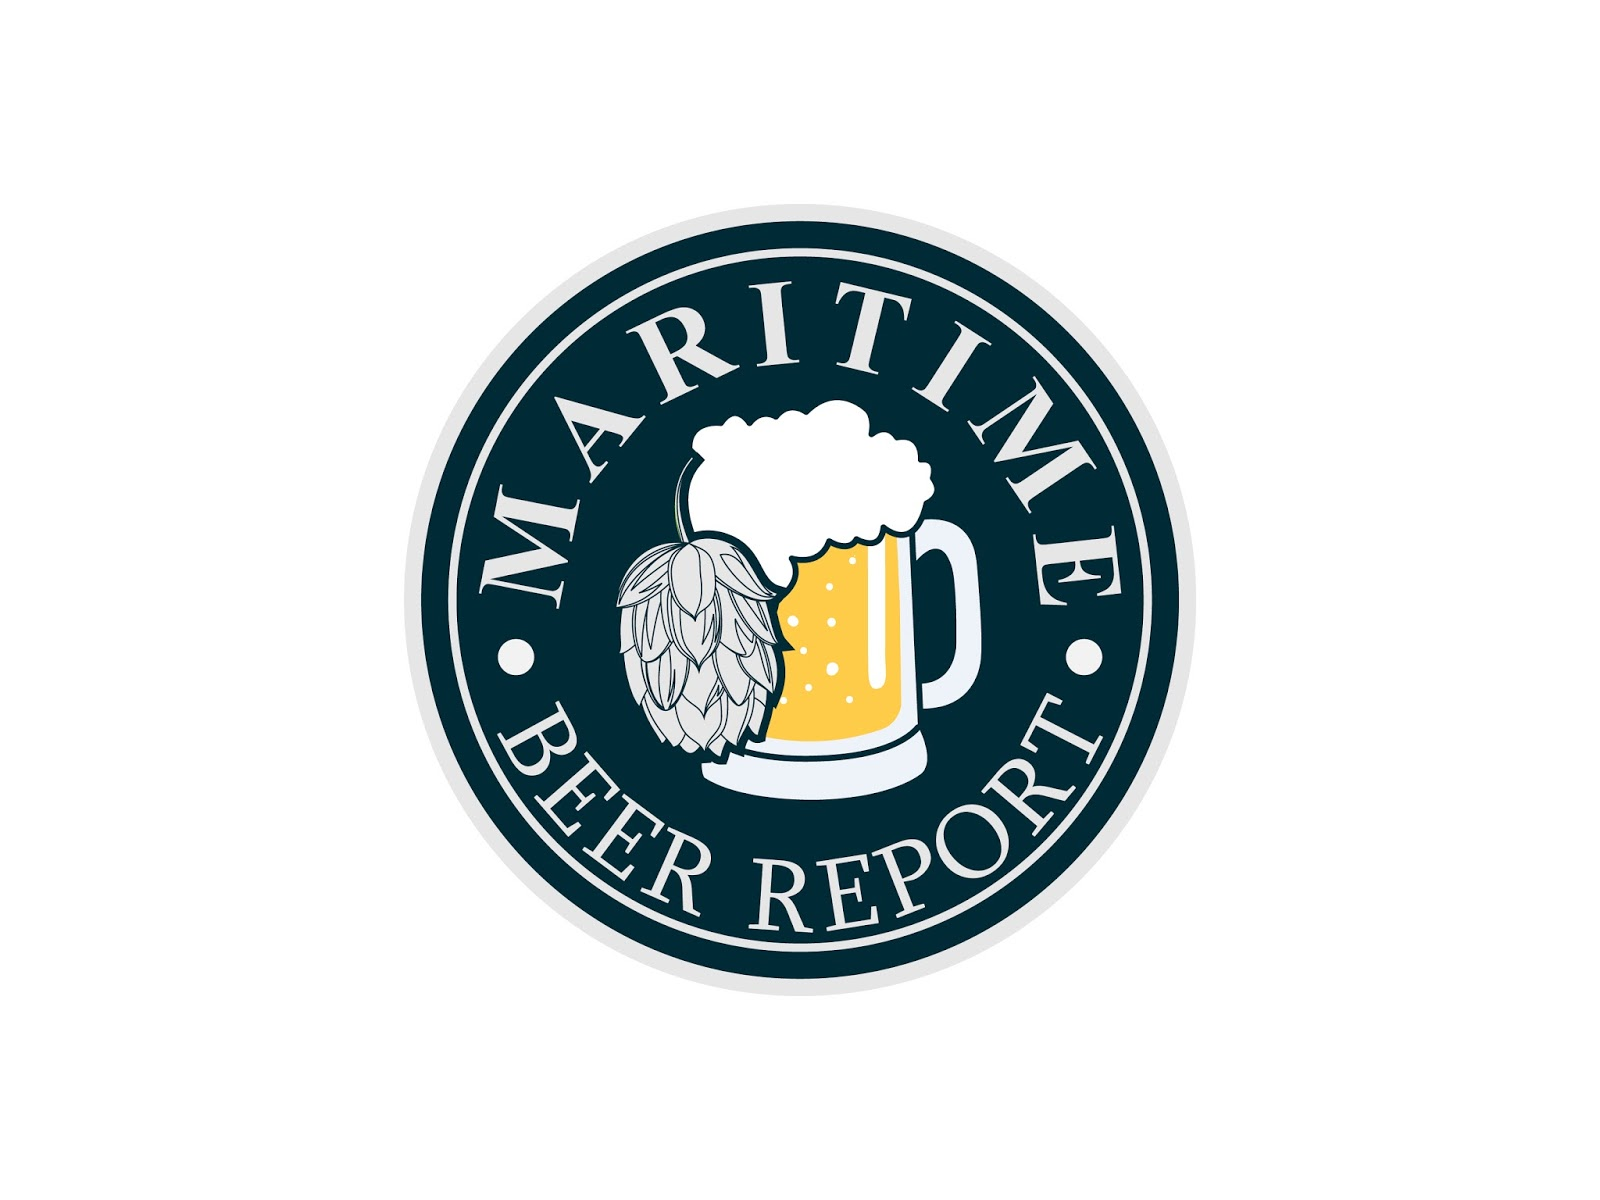 Craft Beer Moncton